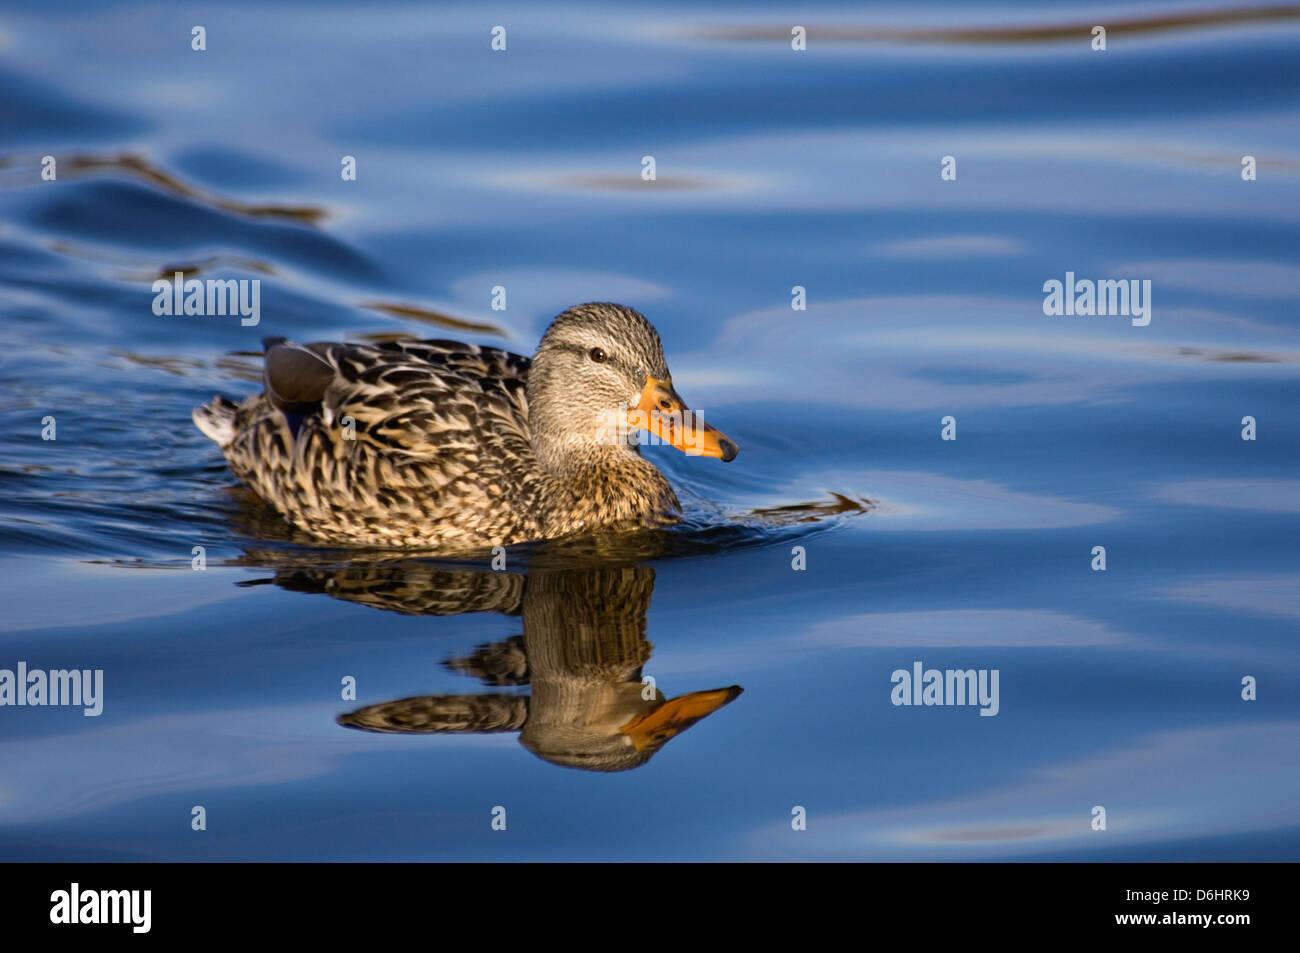 Mallard Duck Female Swimming with Reflection - Stock Image